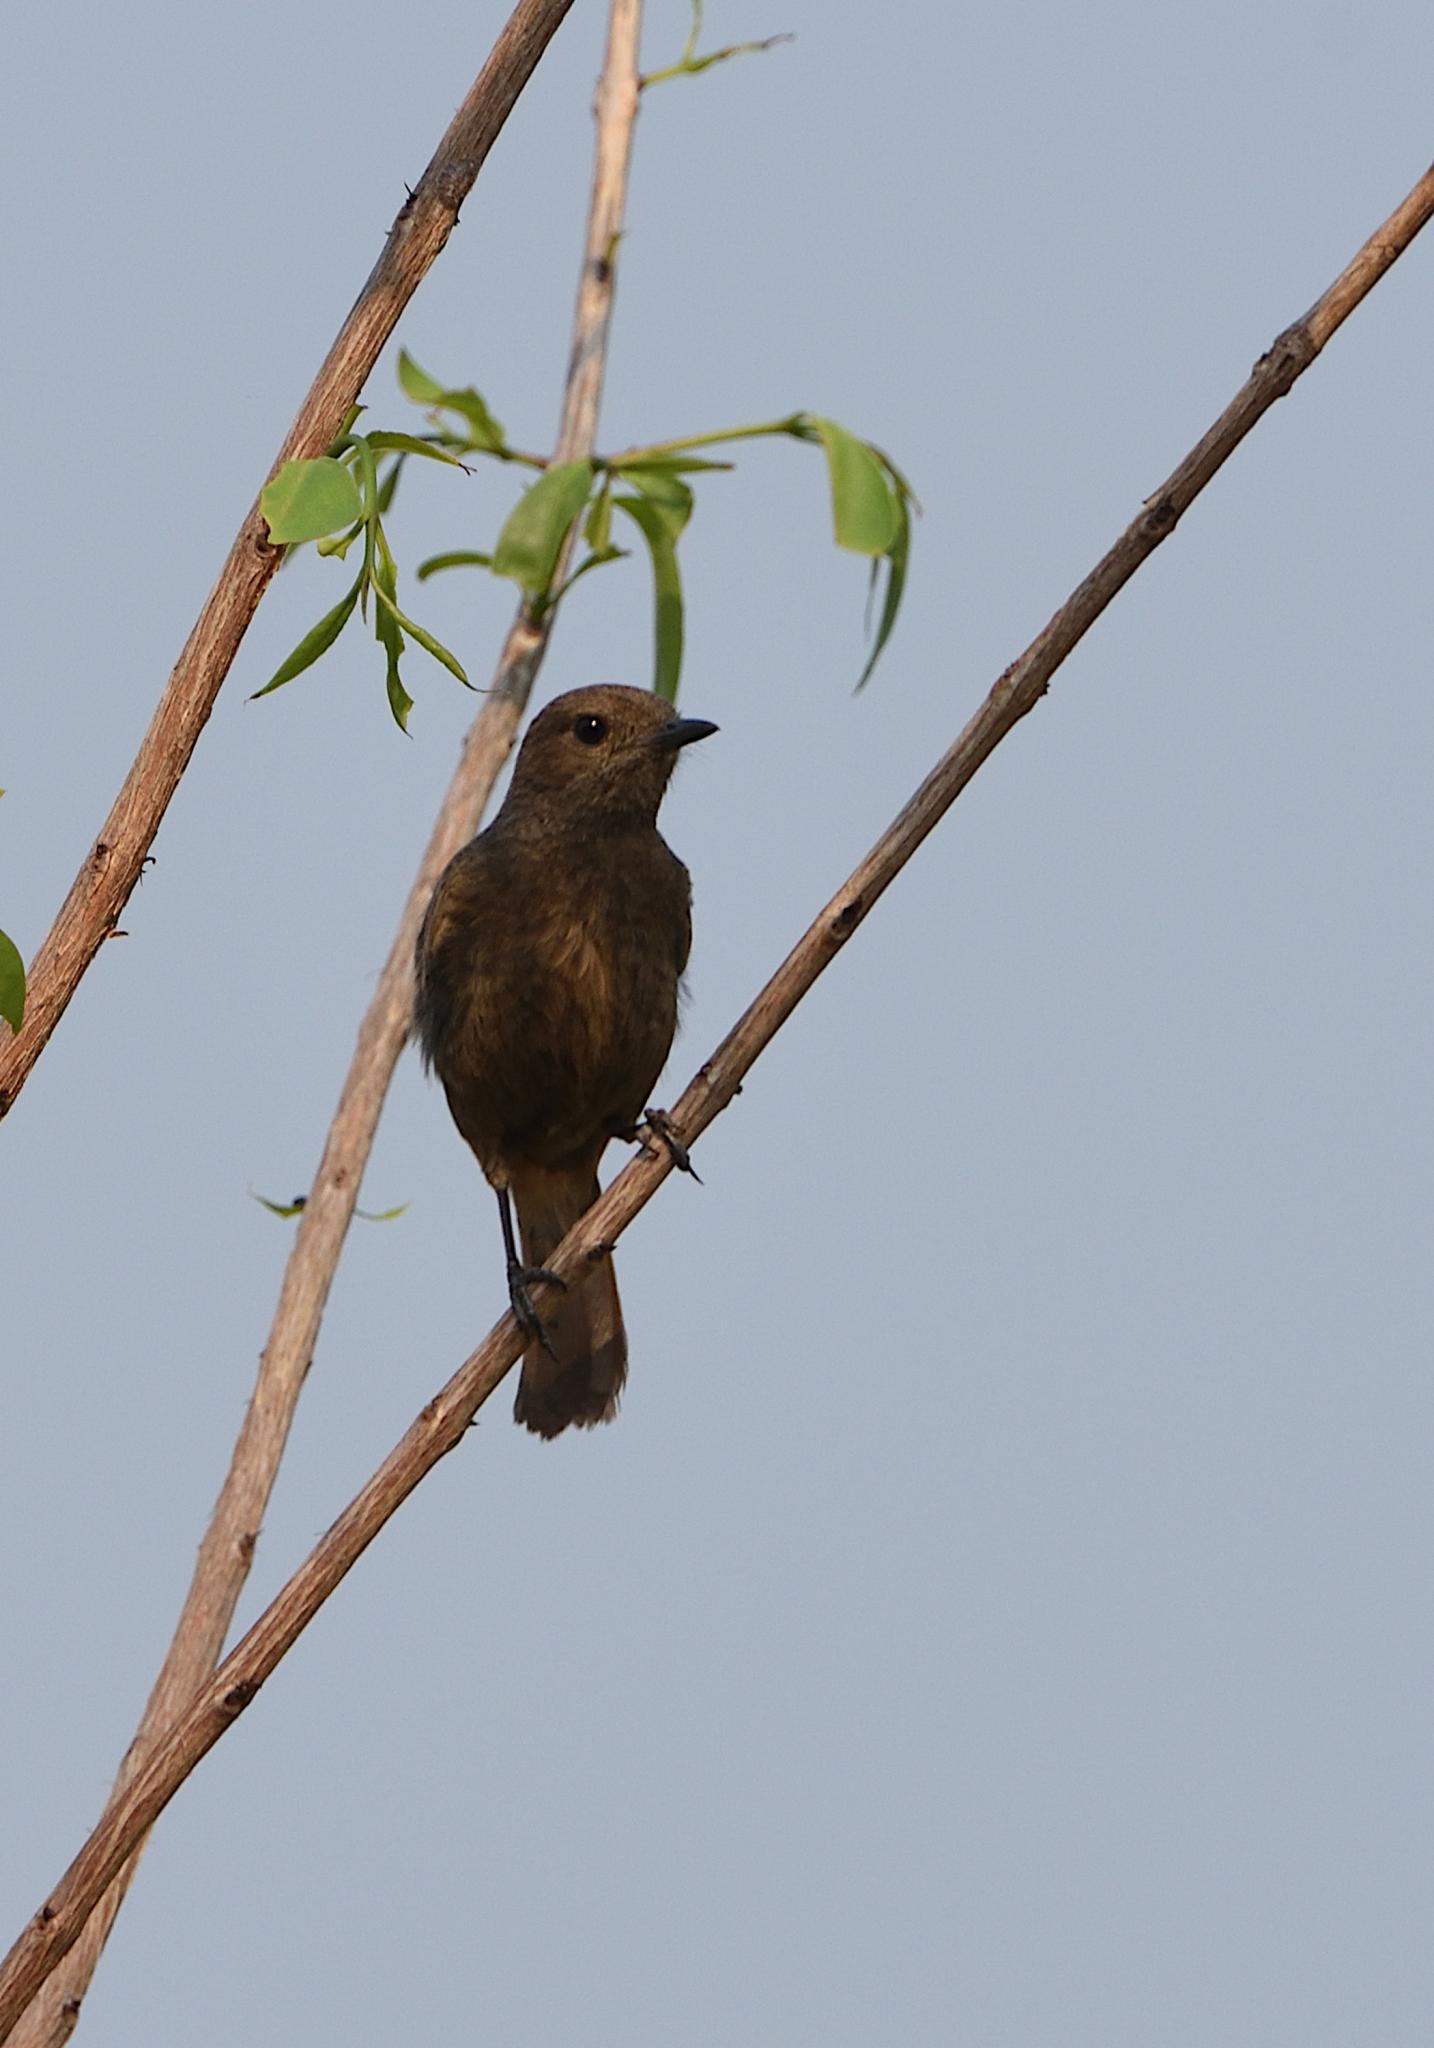 Thailand bird photos-jrh_1053_1s-jpg